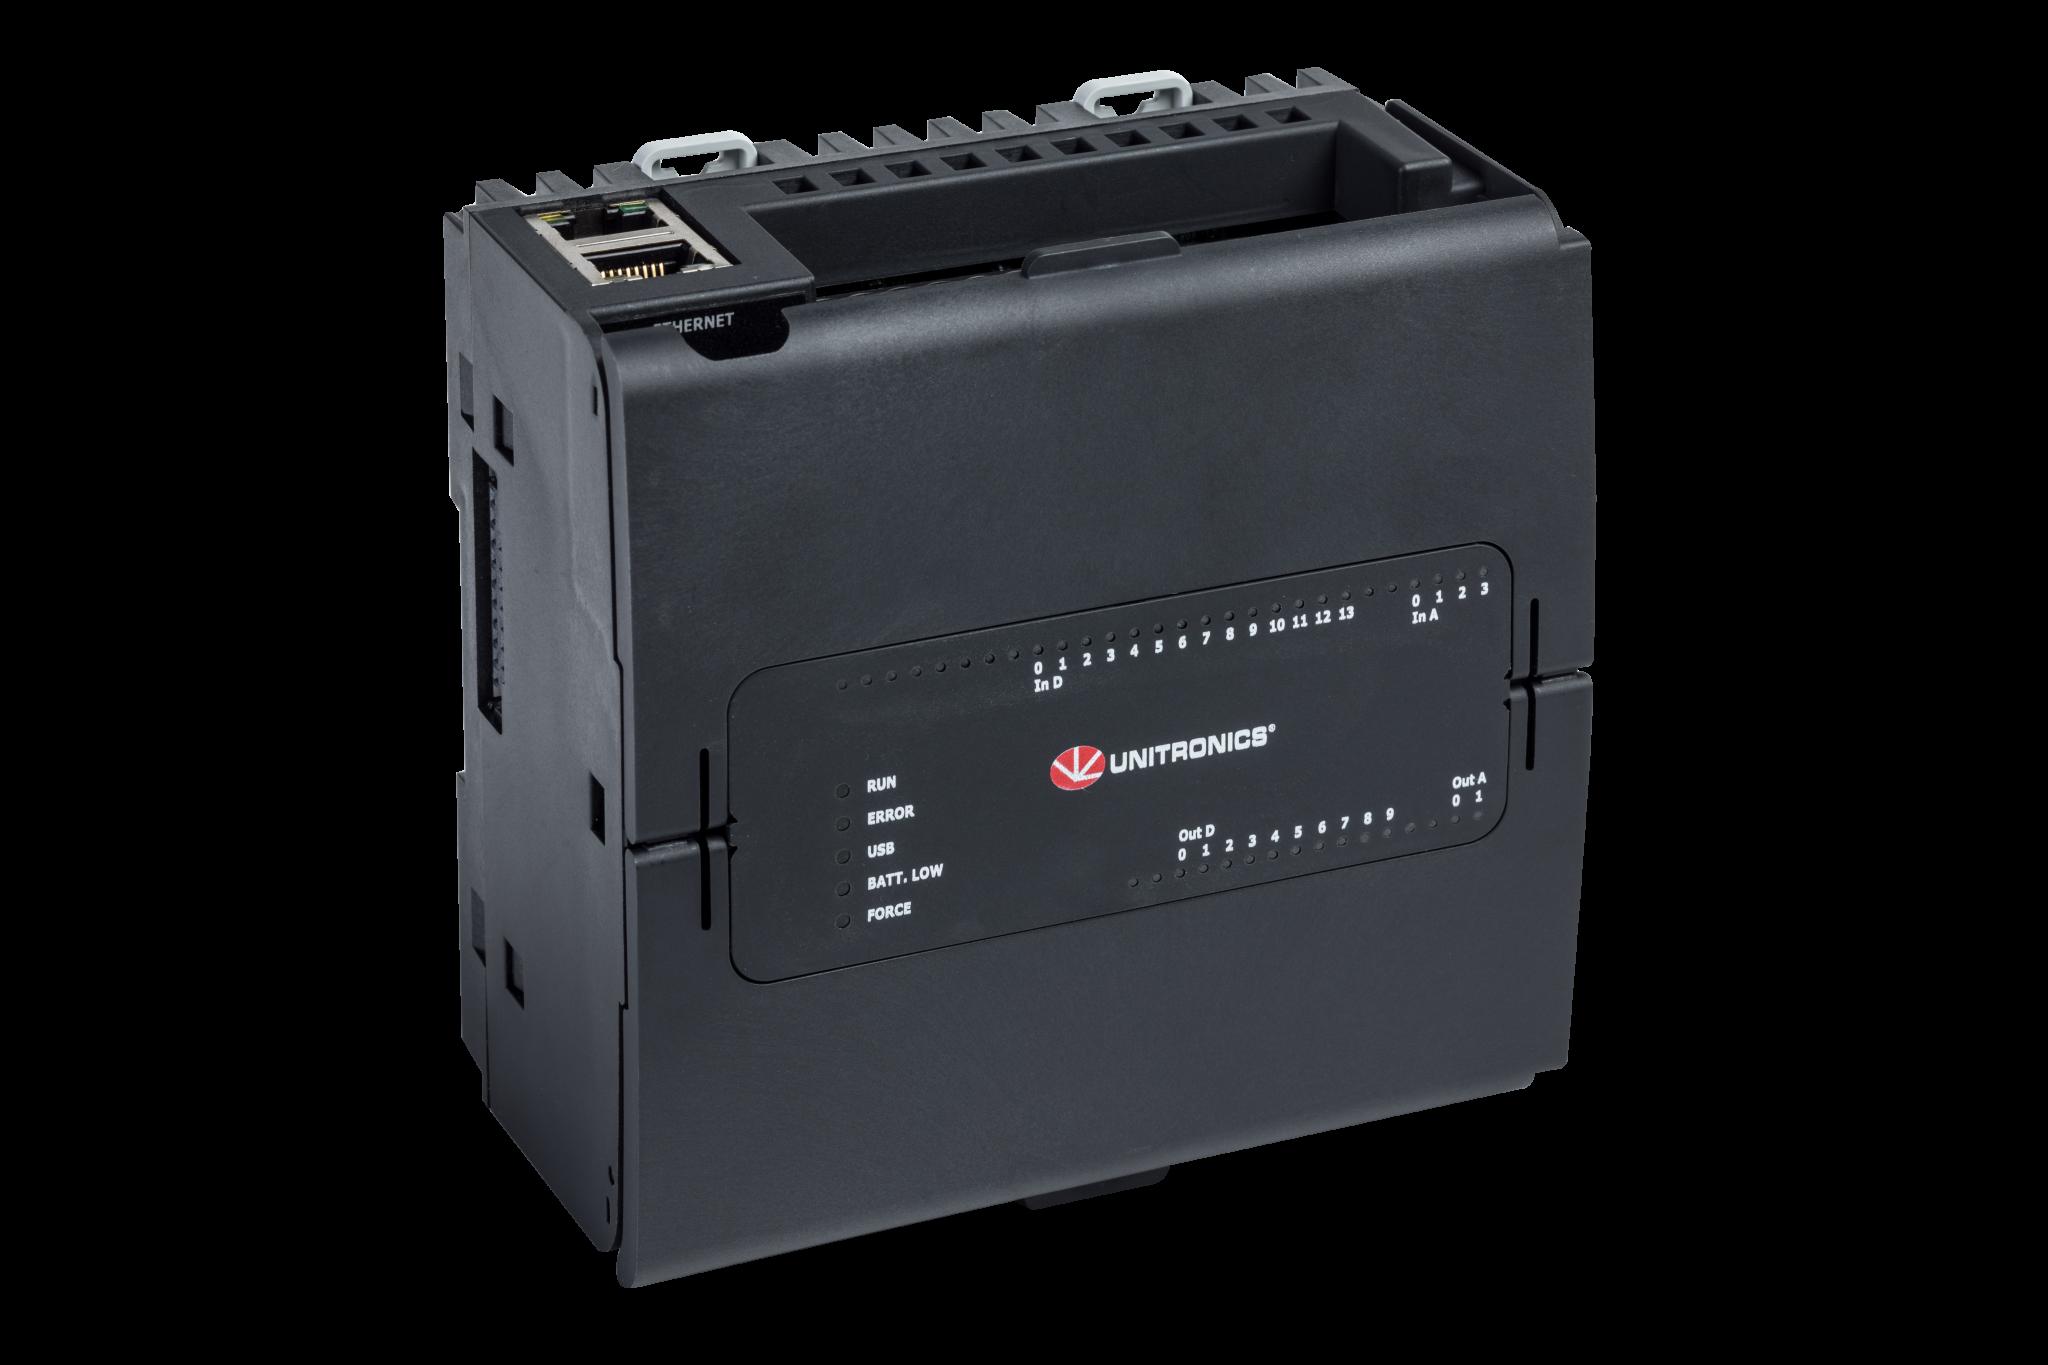 Unistream PLC (USCB5R38)